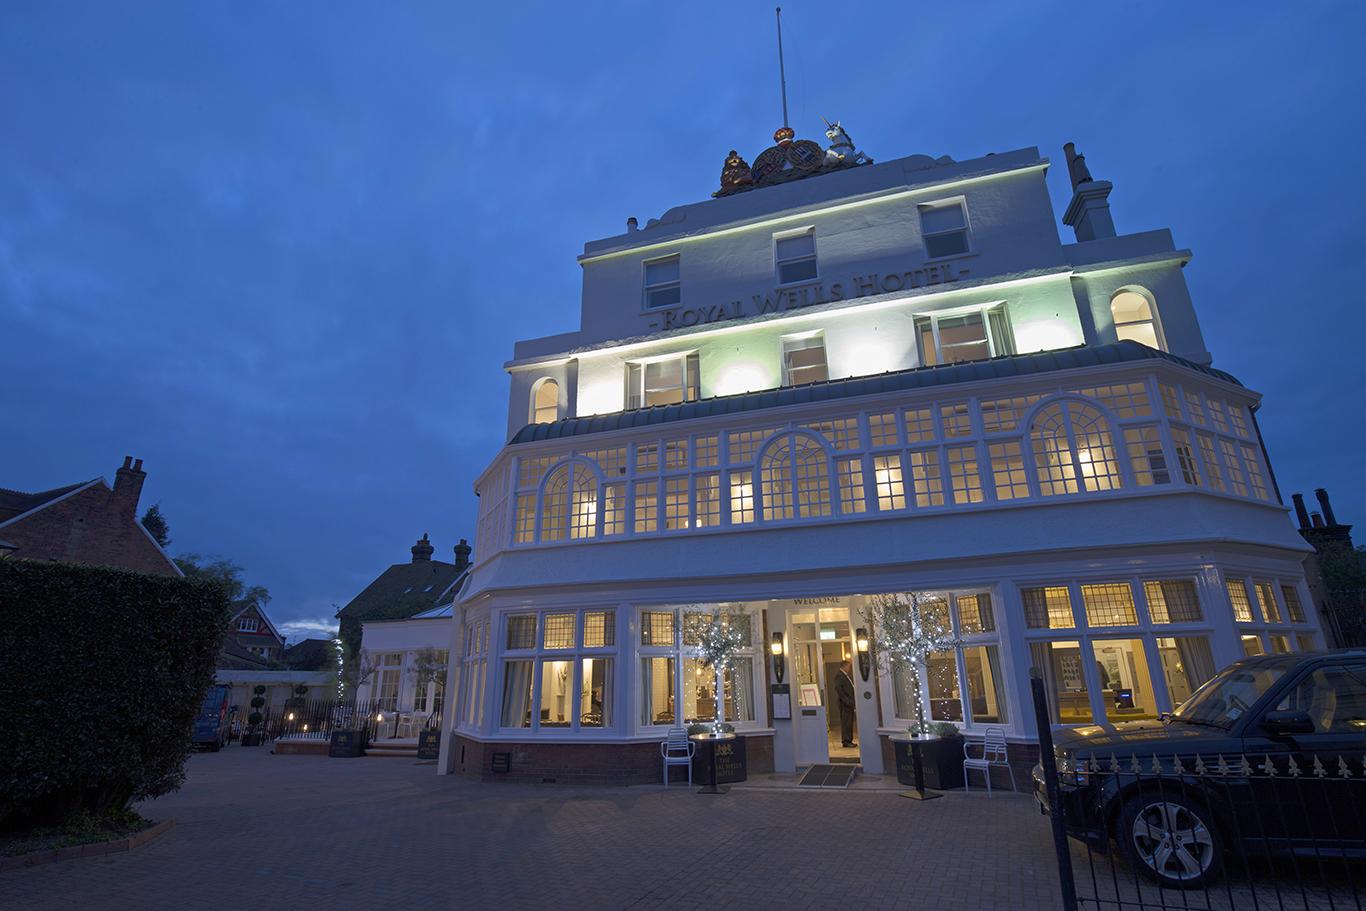 Royal-Wells-Hotel-FI